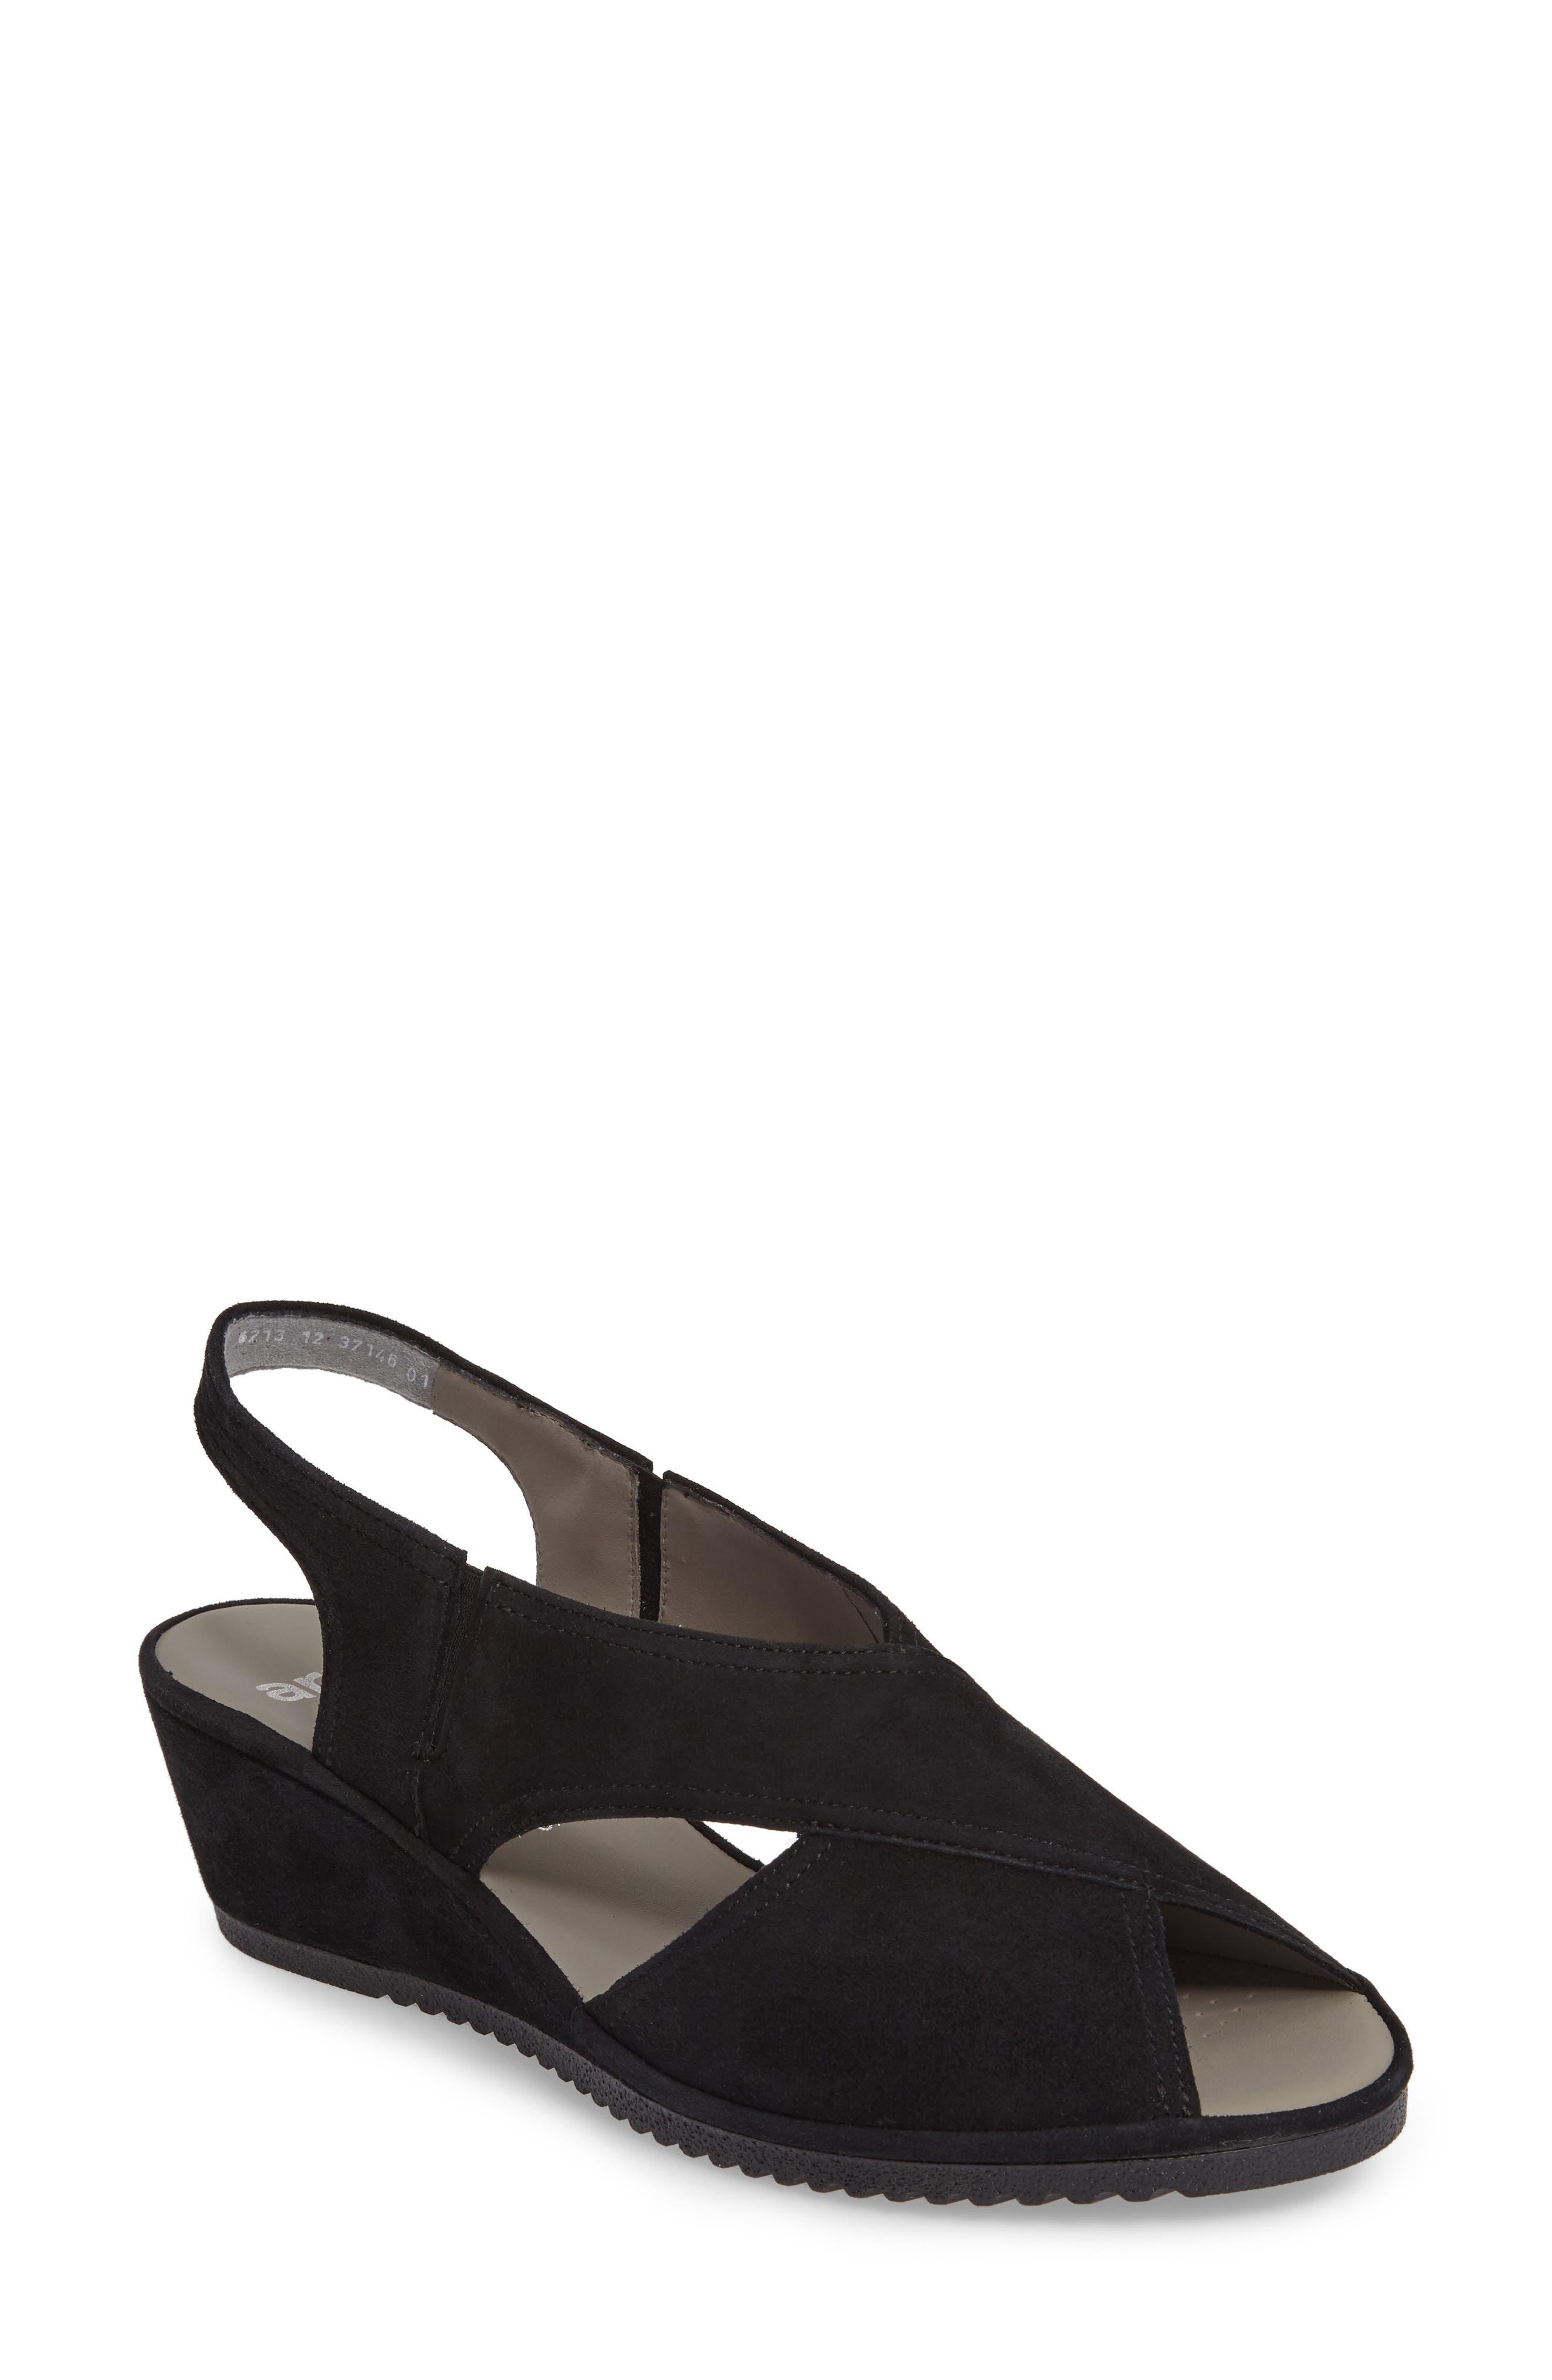 Camila Wedge Sandal,                         Main,                         color,